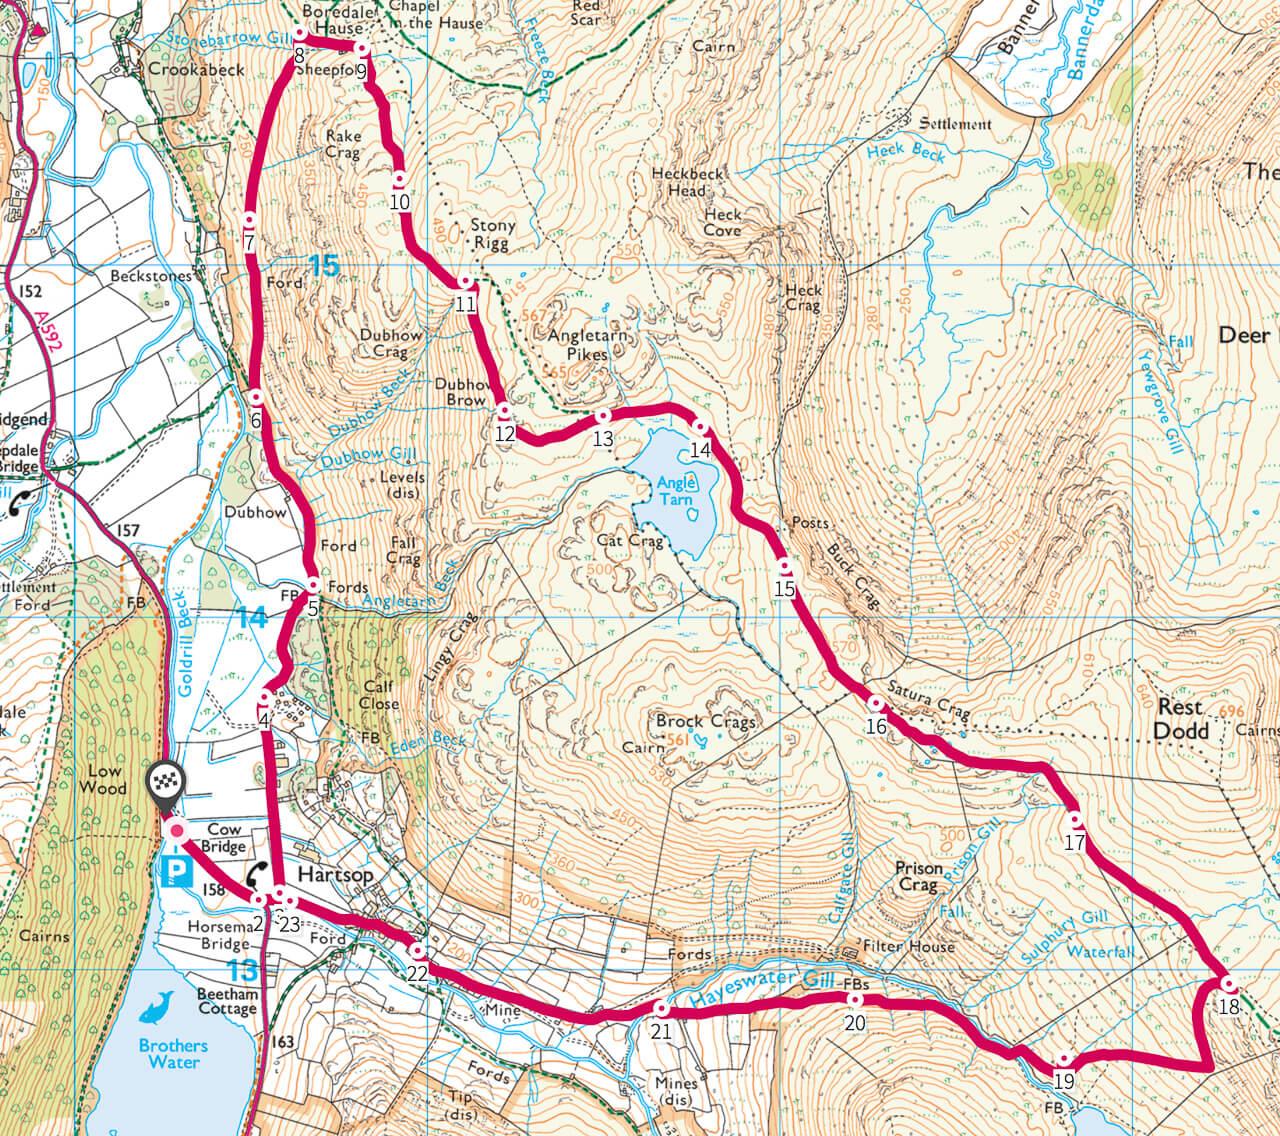 Angle Tarn from Hartsop, Lake District